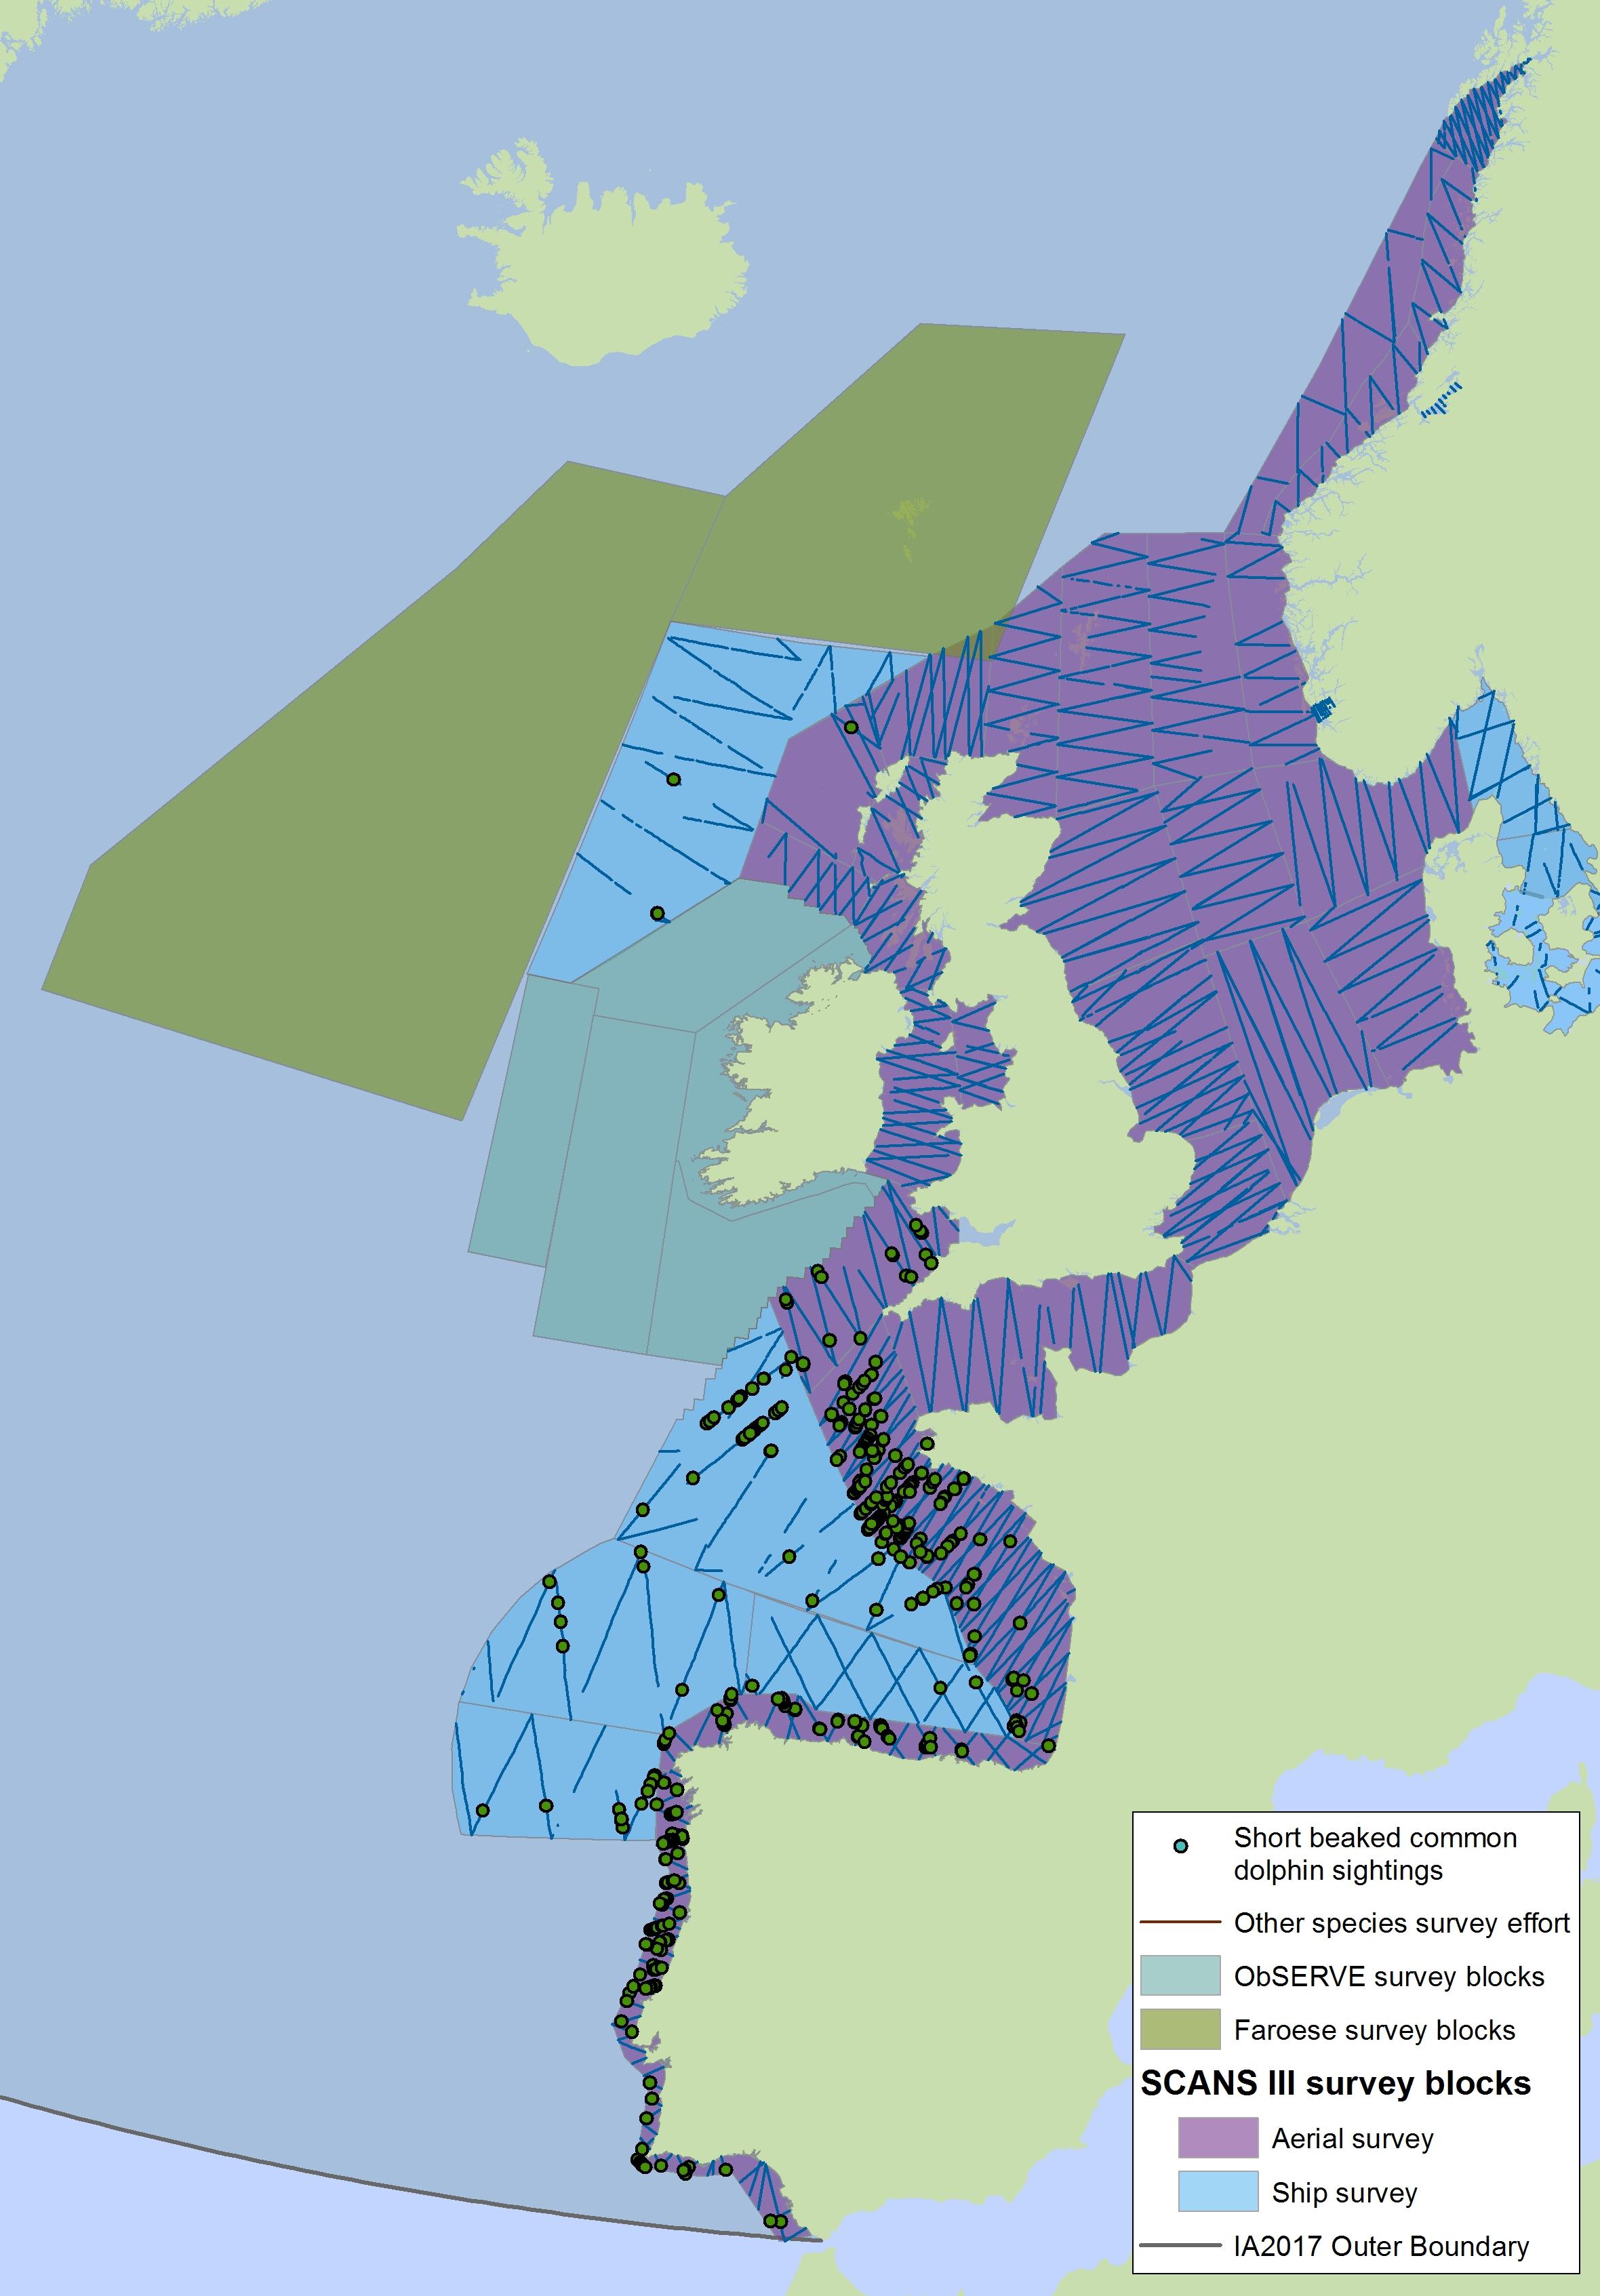 Abundance and Distribution of Cetaceans